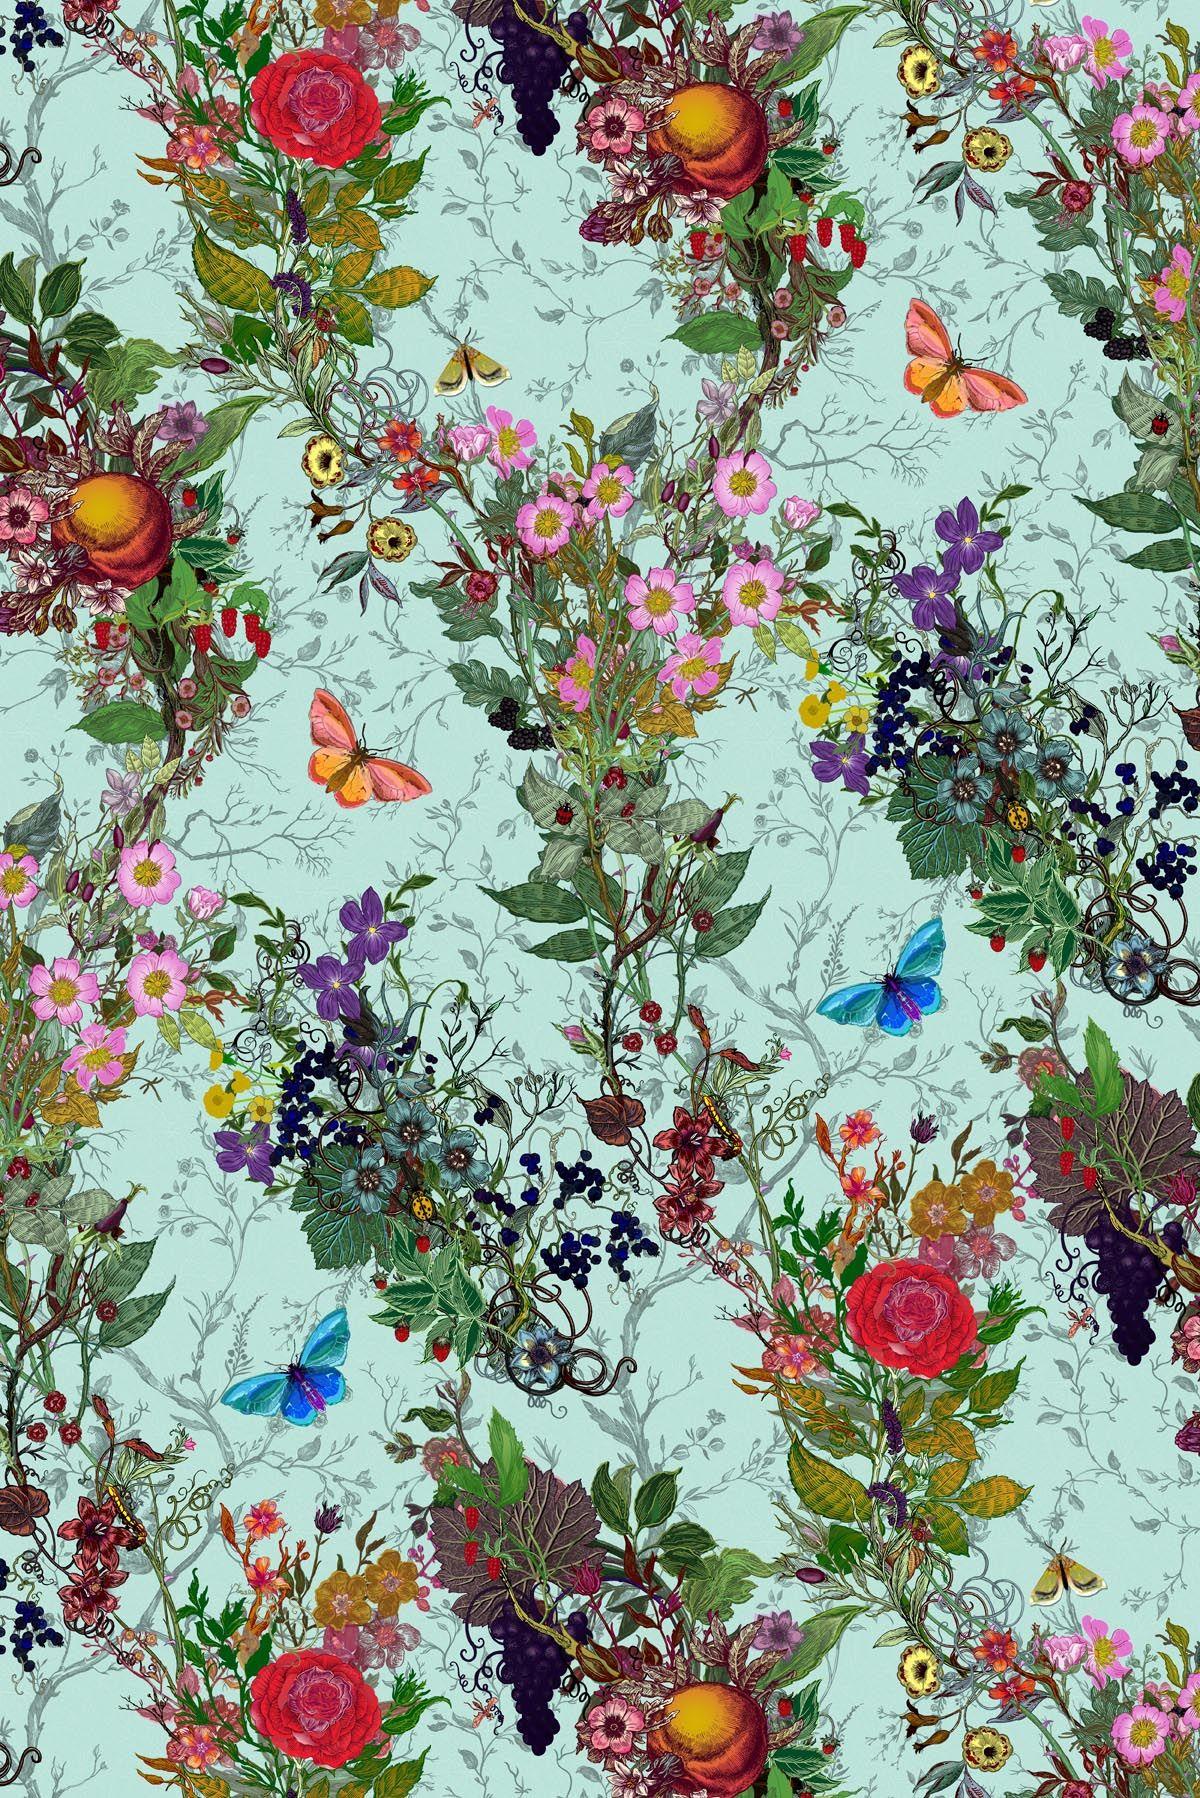 Beautiful-floral-flower-rose-lilac-butterfly-butterflies-spring-garden-red-blue-green-orange-purple-wallpaper-wpc9002694